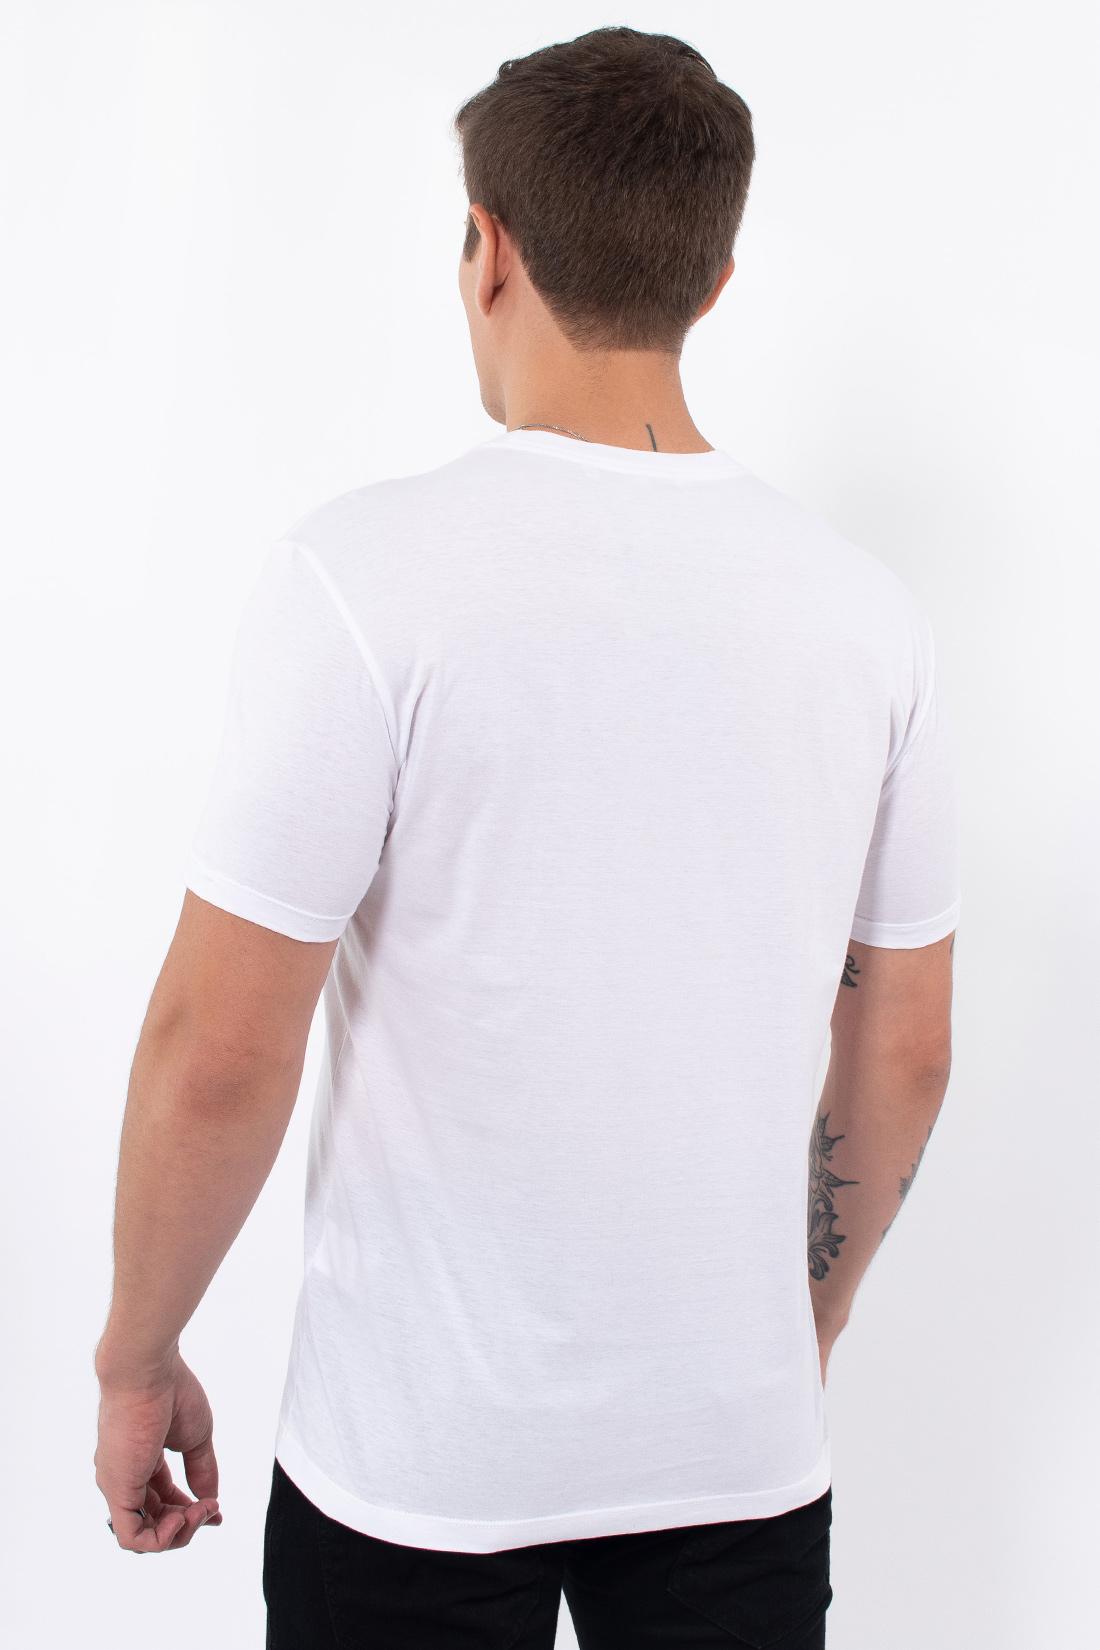 Camiseta Mc Calvin Klein New York City